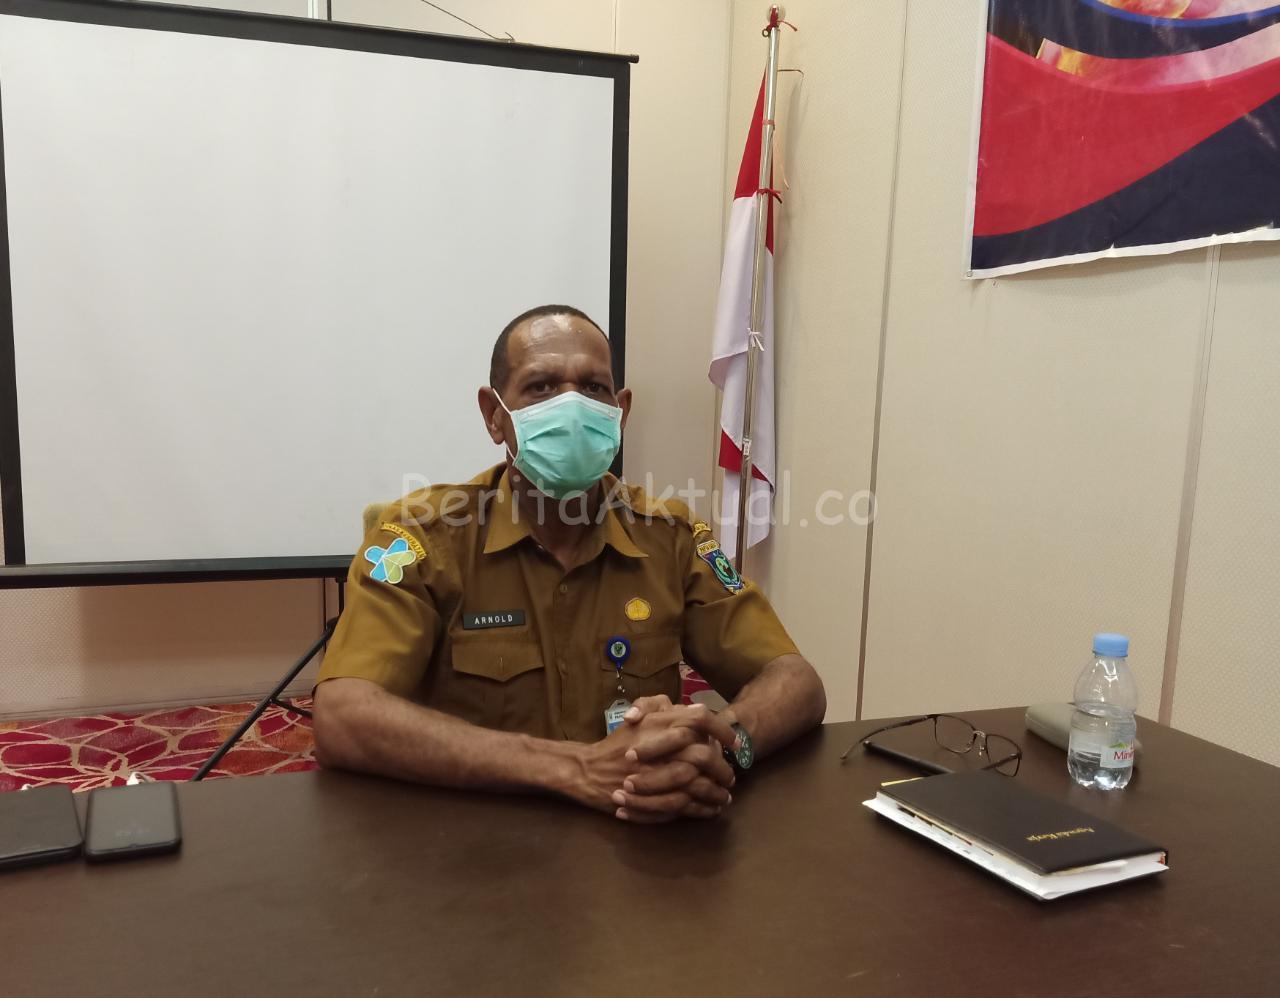 Sampai Hari ini Senin 4 Mei, Papua Barat Tidak Ada Penambahan Pasien Positif 17 IMG 20200504 WA0045